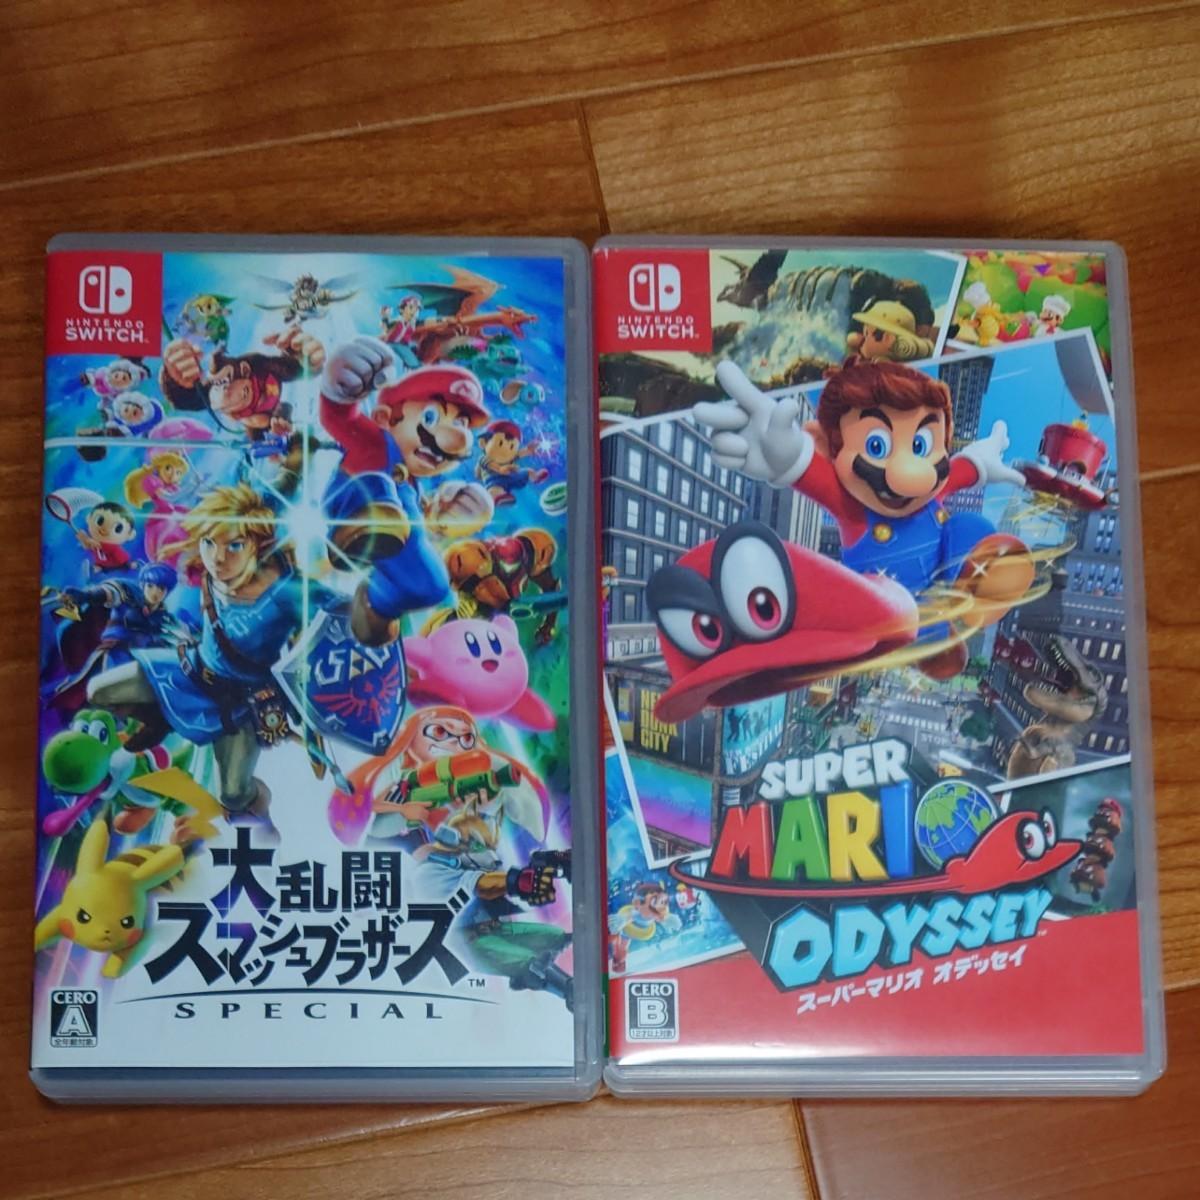 Nintendo Switch 大乱闘スマッシュブラザーズSPECIAL スーパーマリオオデッセイ セット